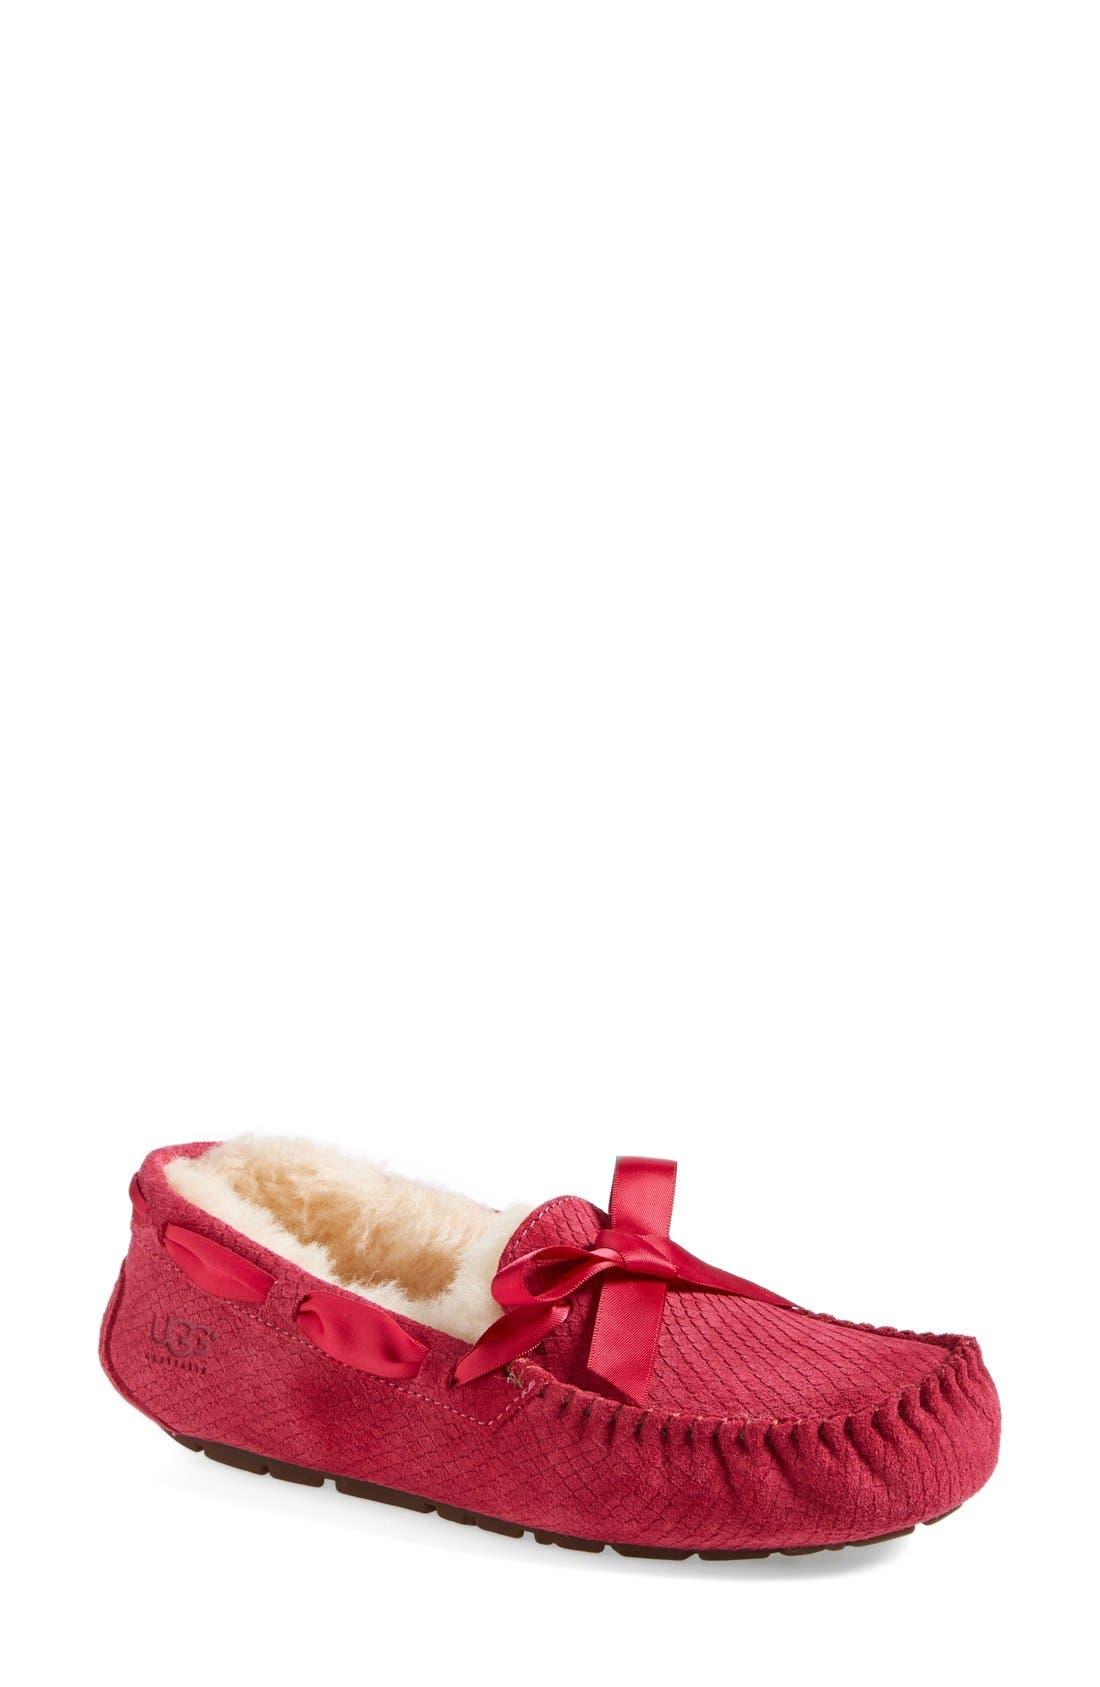 Main Image - UGG® Australia 'Dakota - Exotic Scales' Suede Slipper (Women)